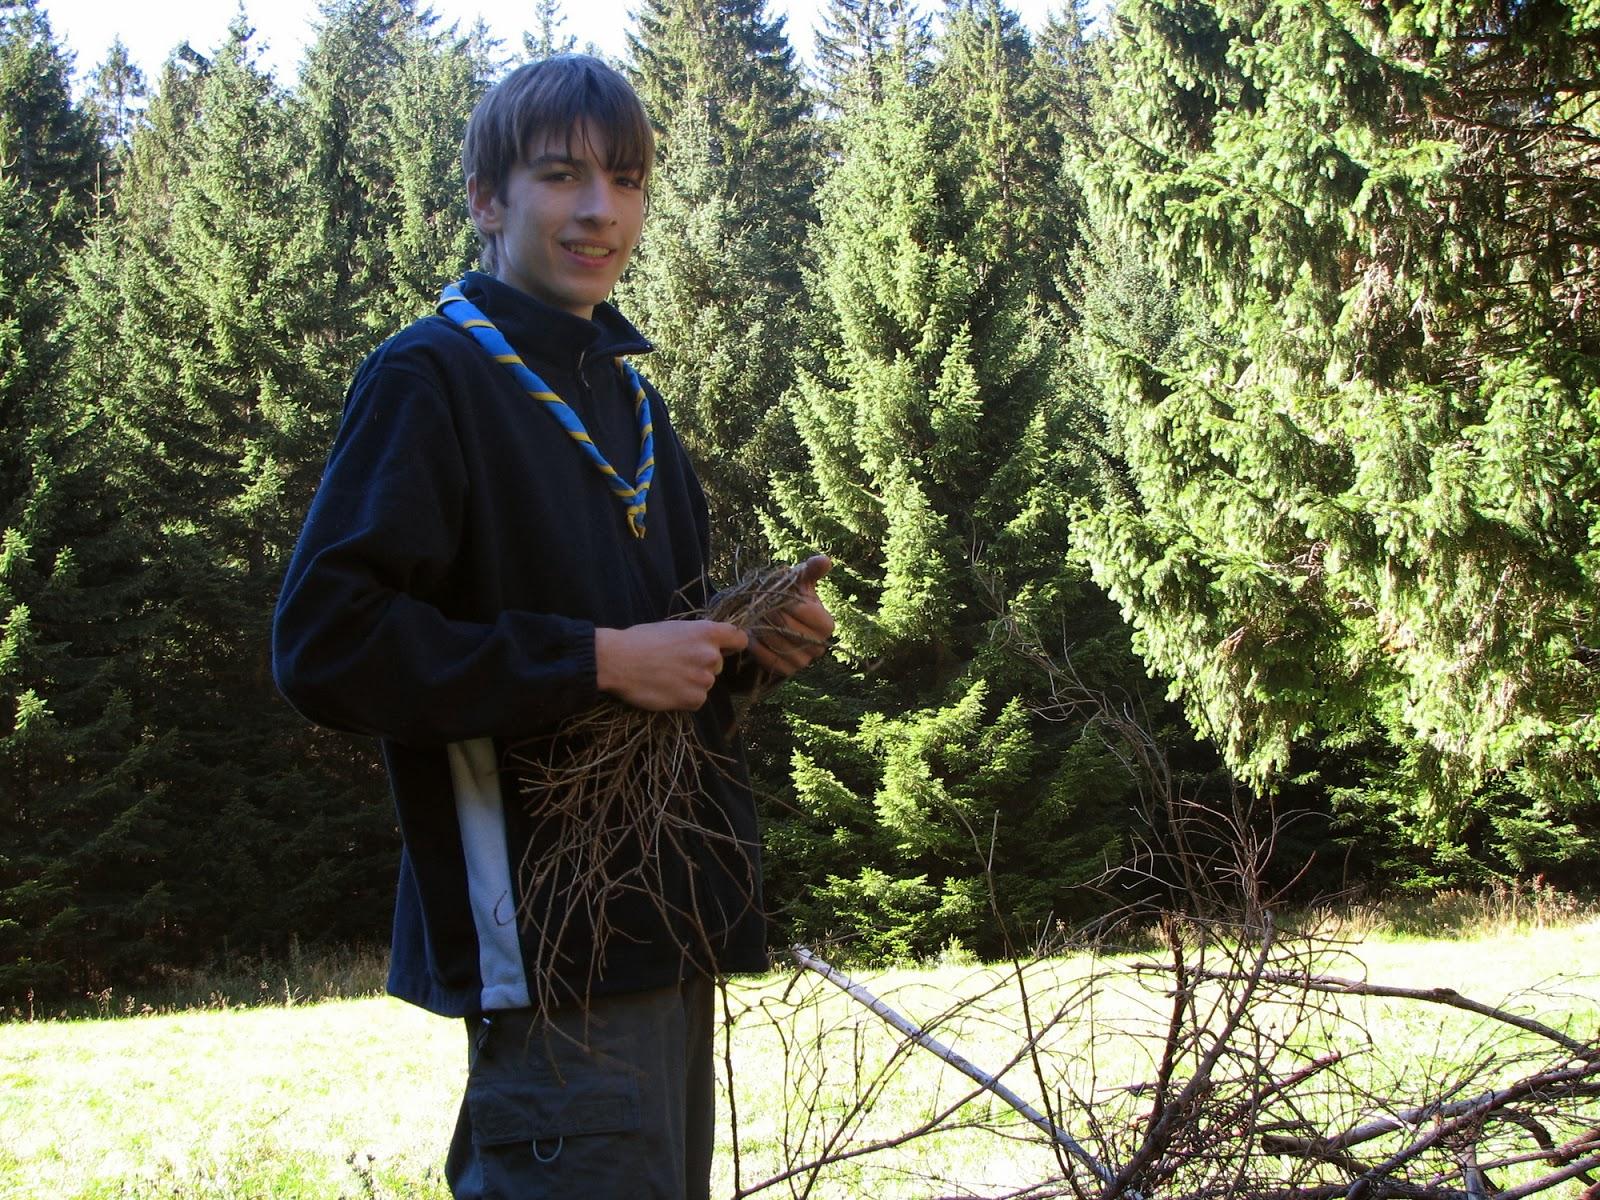 Vodov izlet, Ilirska Bistrica 2005 - Picture%2B122.jpg